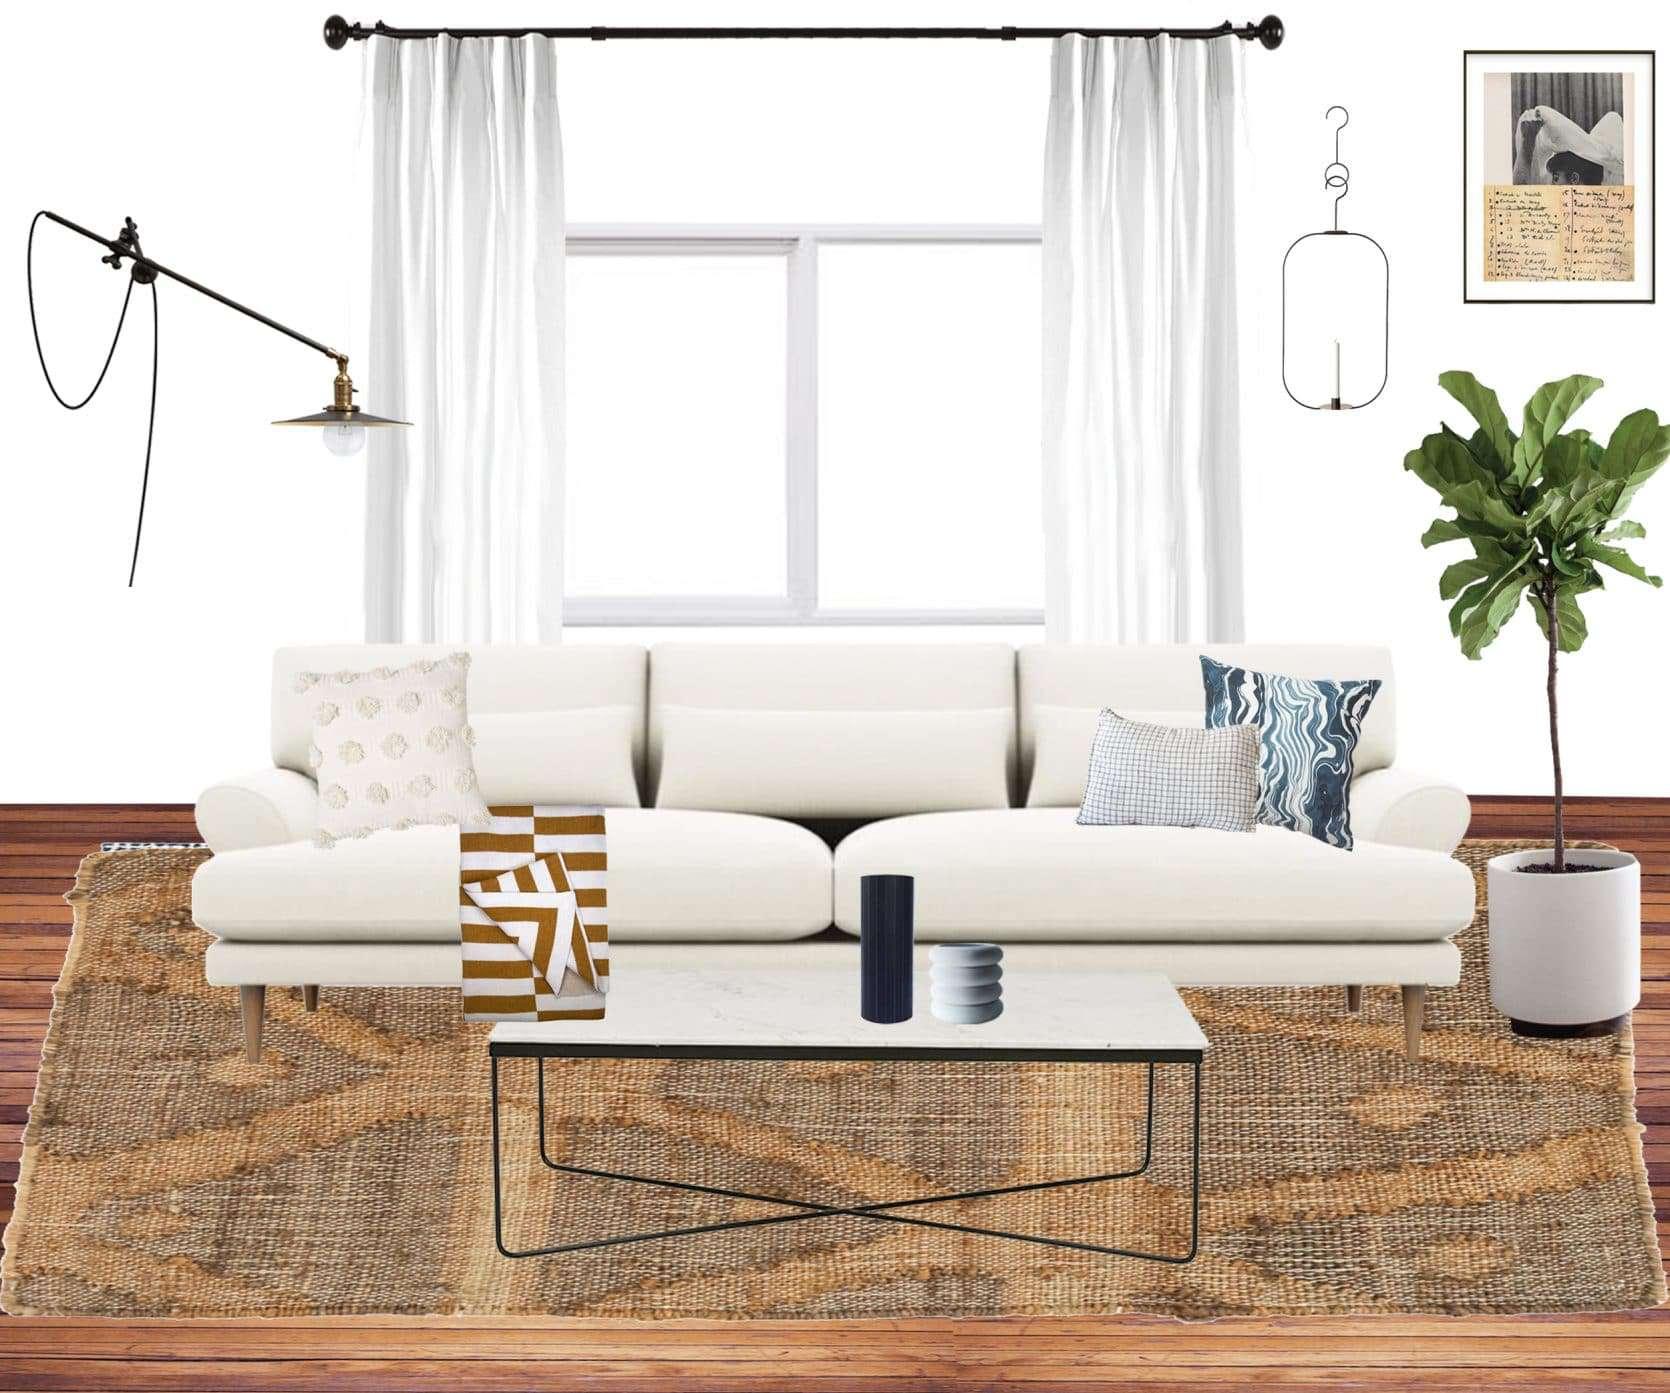 Emily Henderson Jess Moto Living Room Mood Board 2